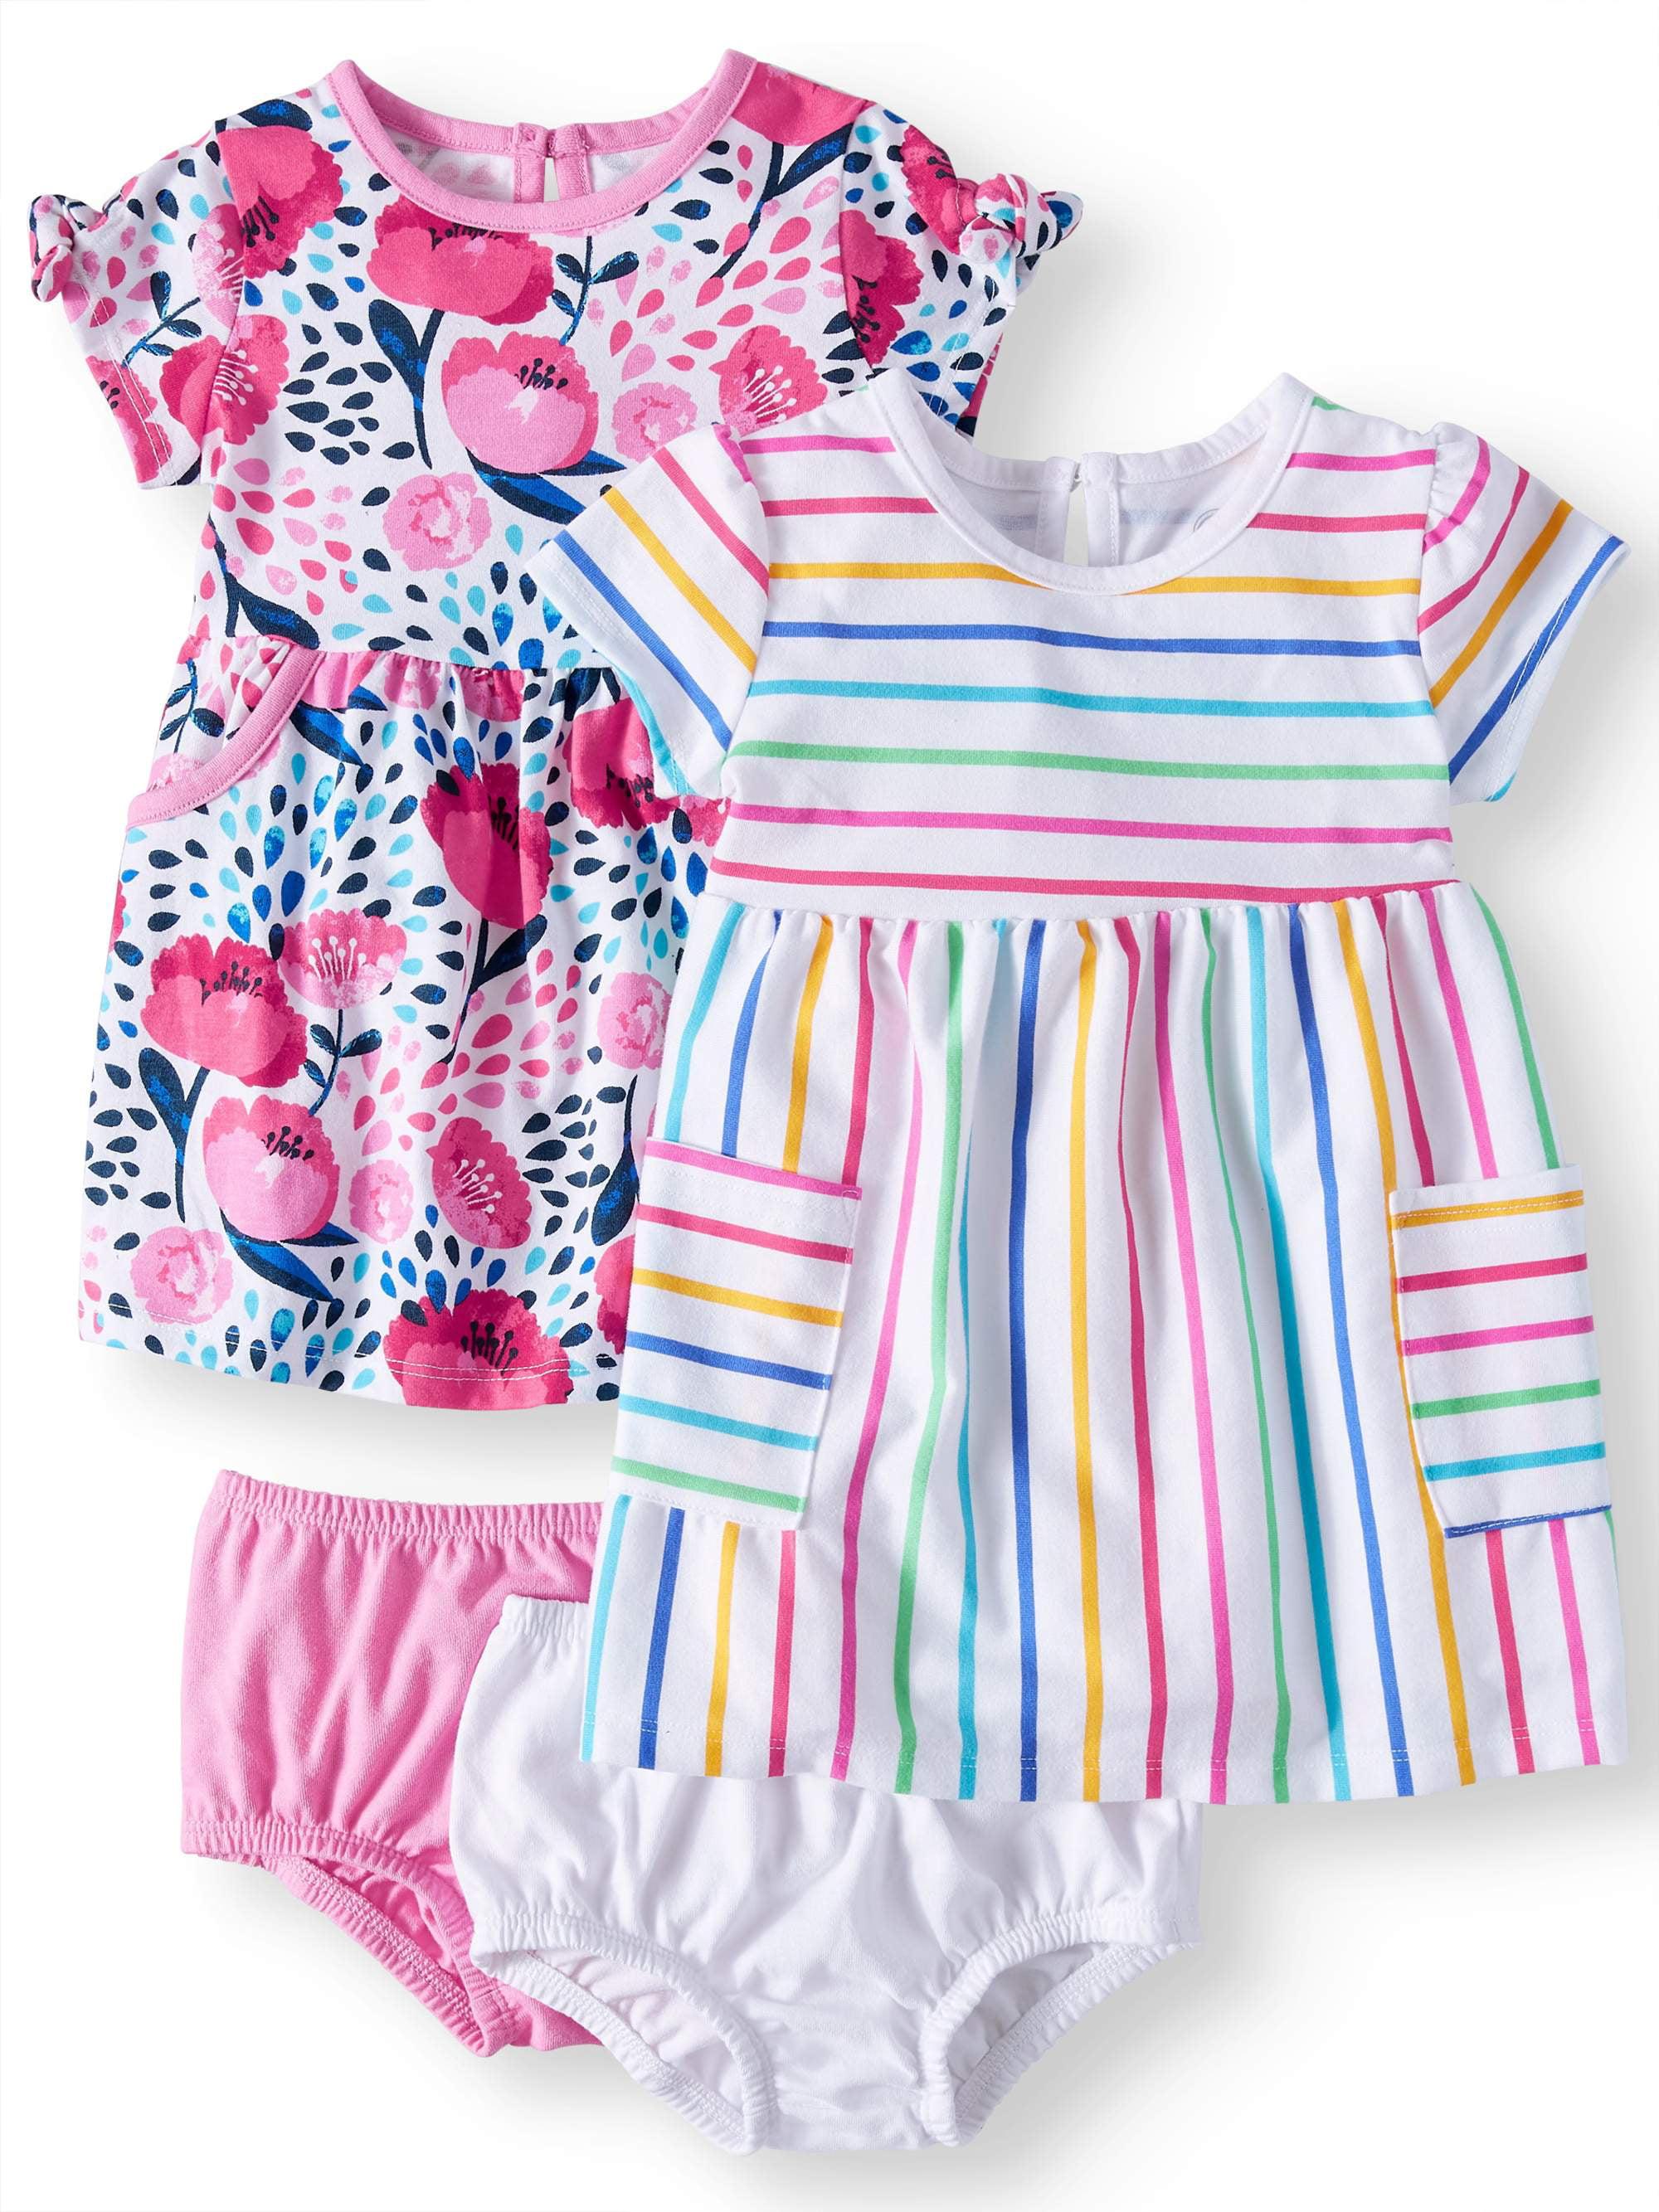 8a6be4f6ed0 Wonder Nation - Baby Girls  Knit Dresses